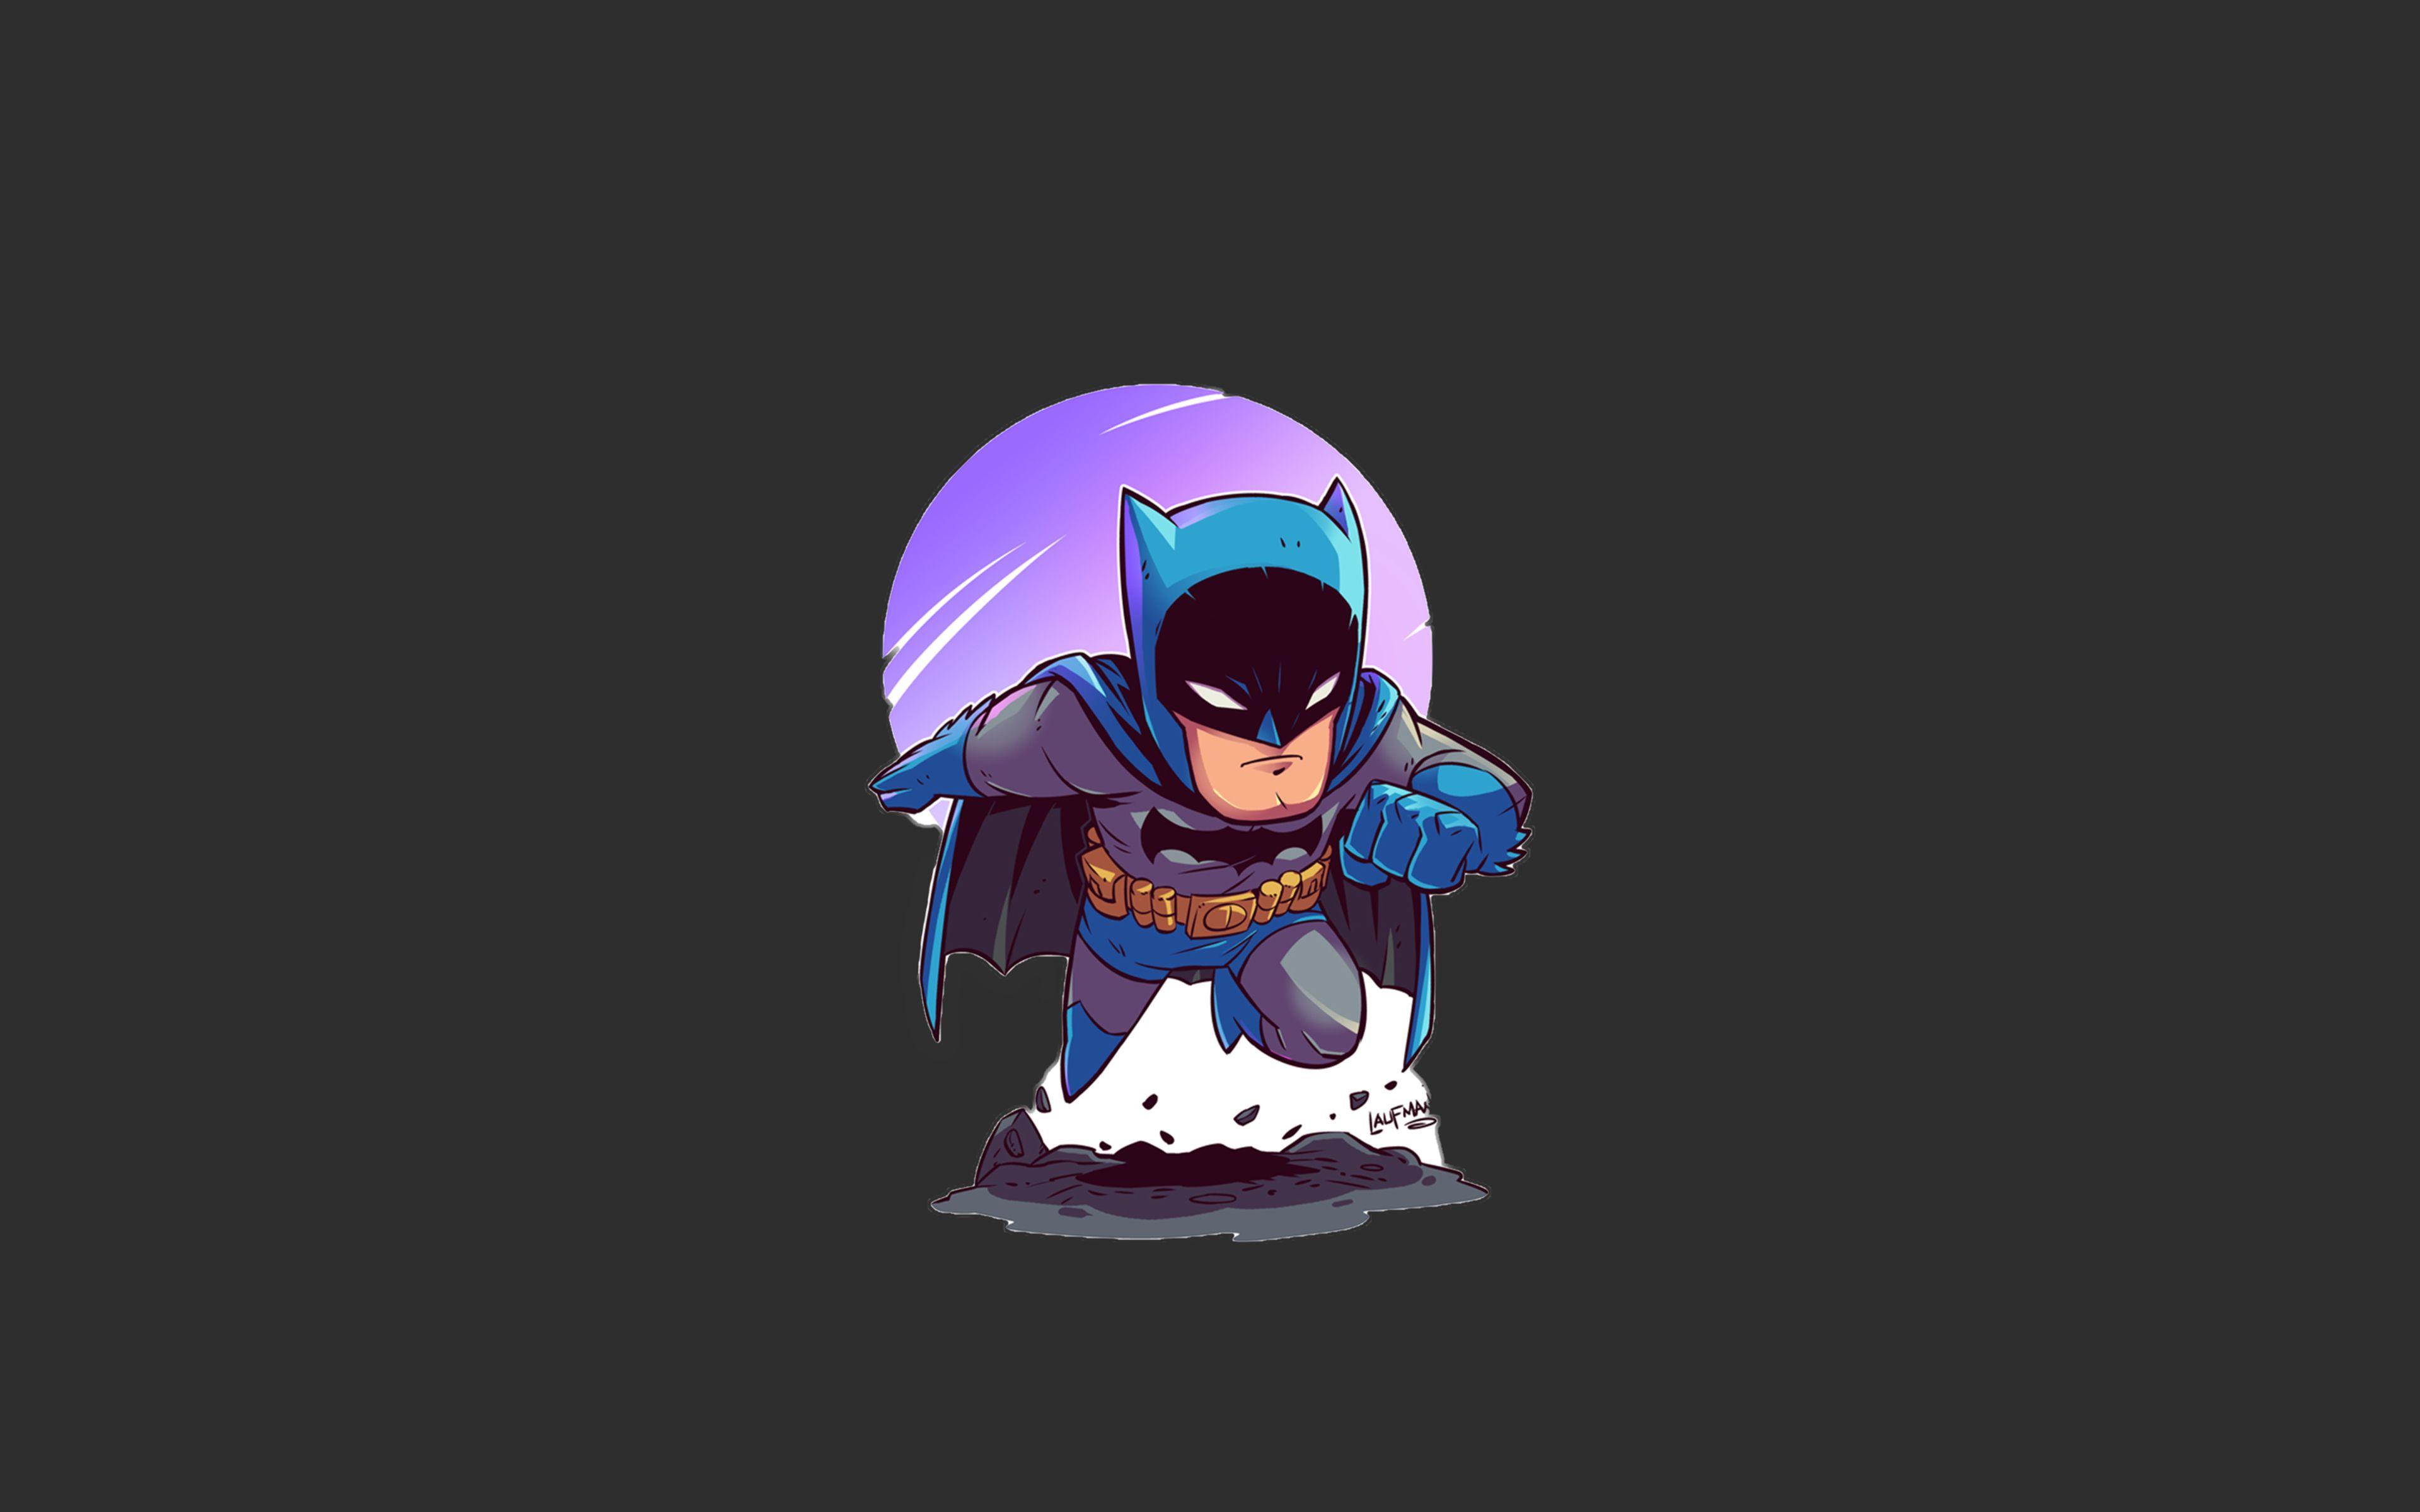 Batman, 4k, Superhéroes, Mínimo, Fondo Gris